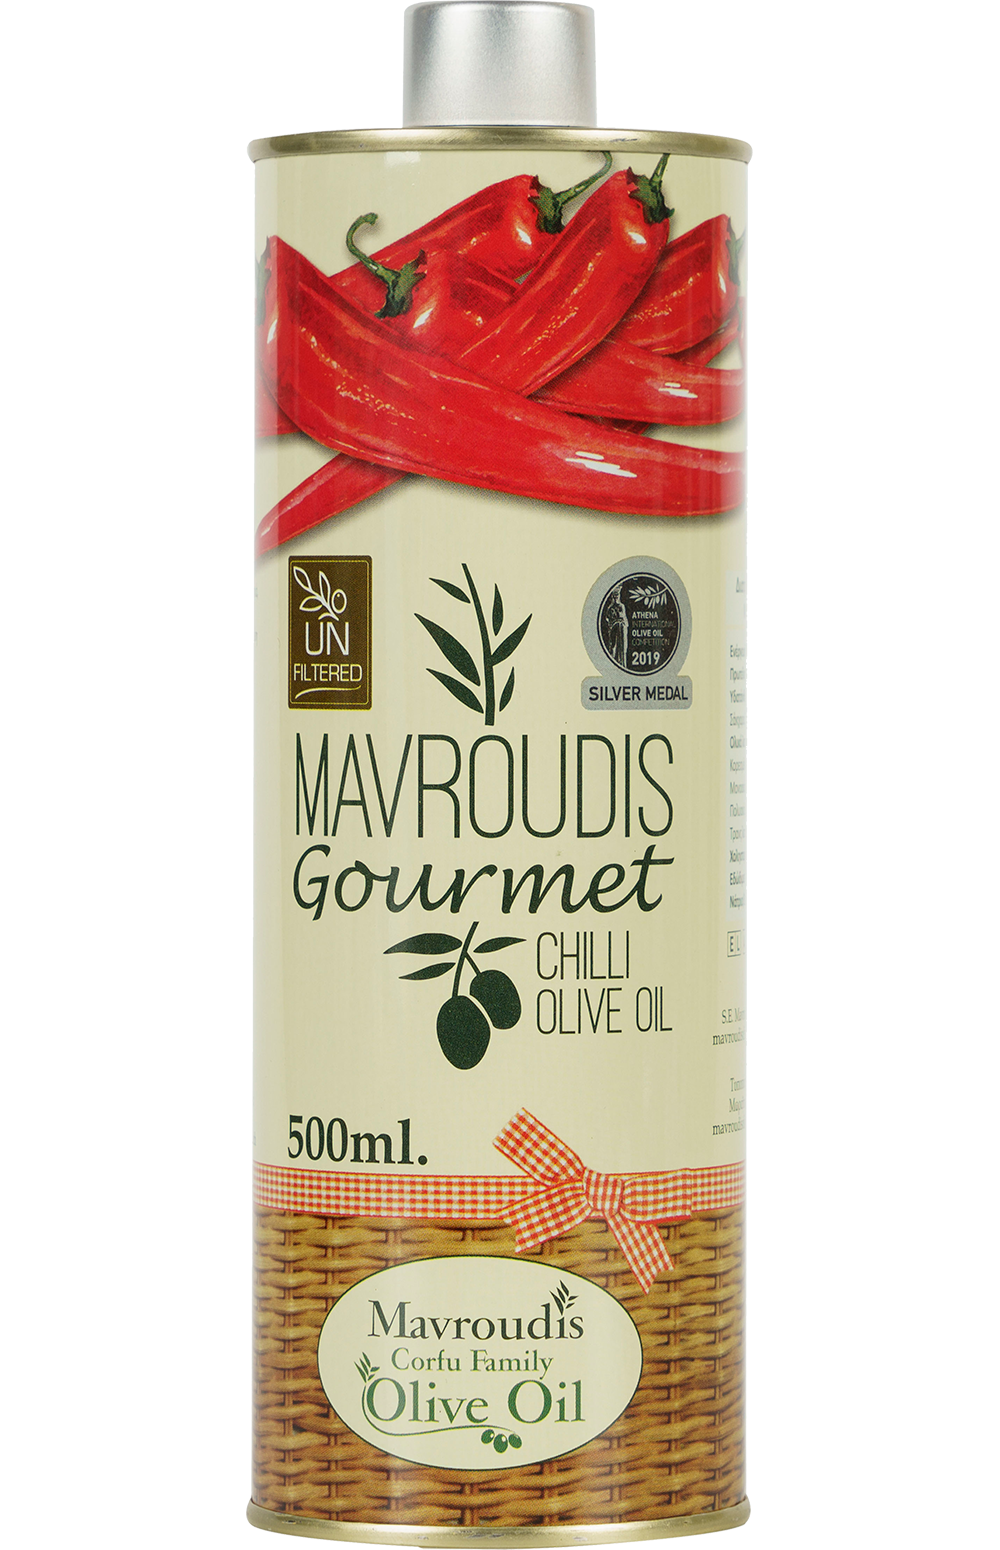 Mavroudis Gourmet Chili